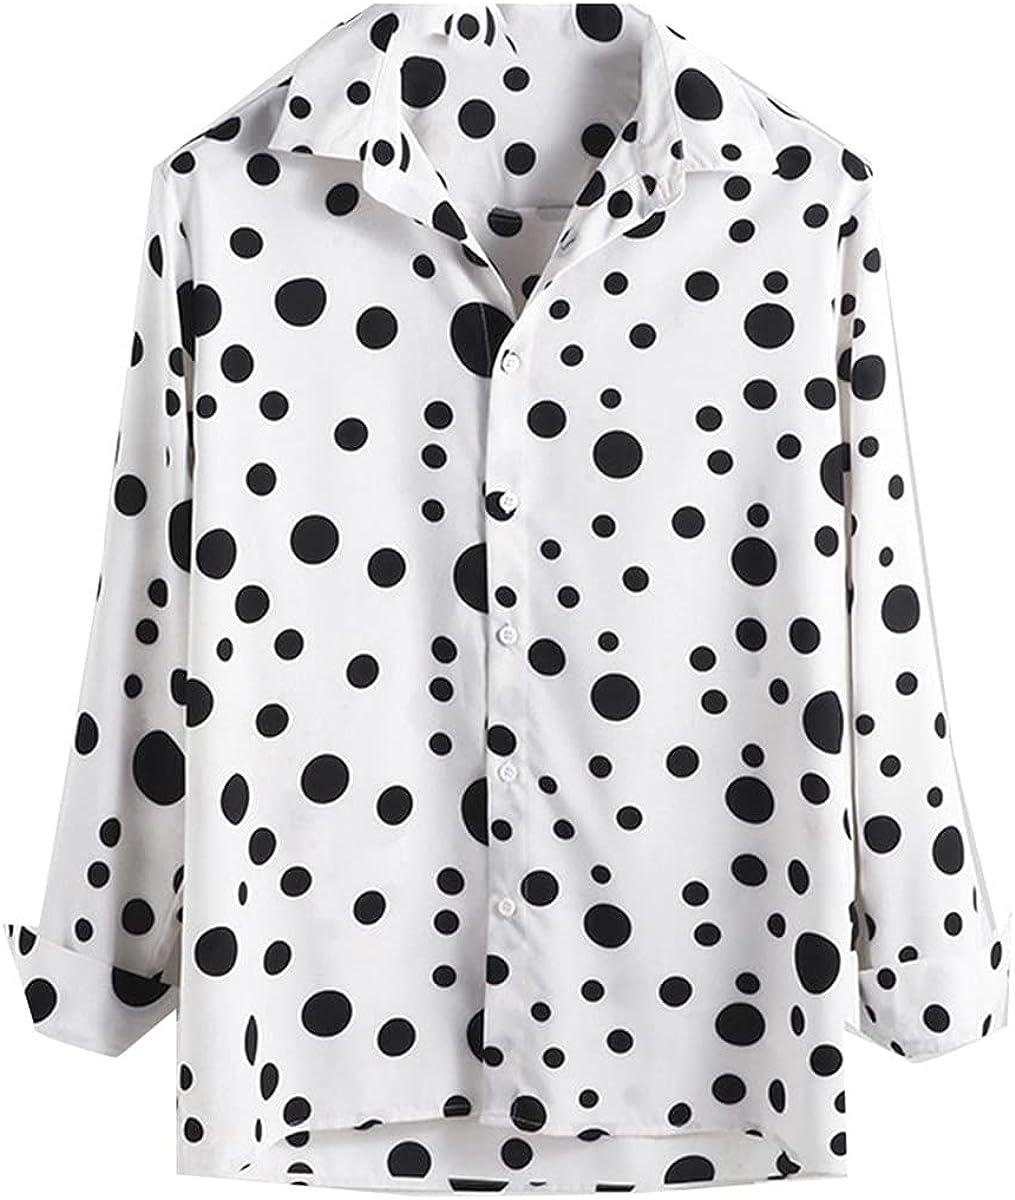 Men's Slim Big Dot Long Sleeve Shirt Business Fitness Casual Lapel Collar Button Top